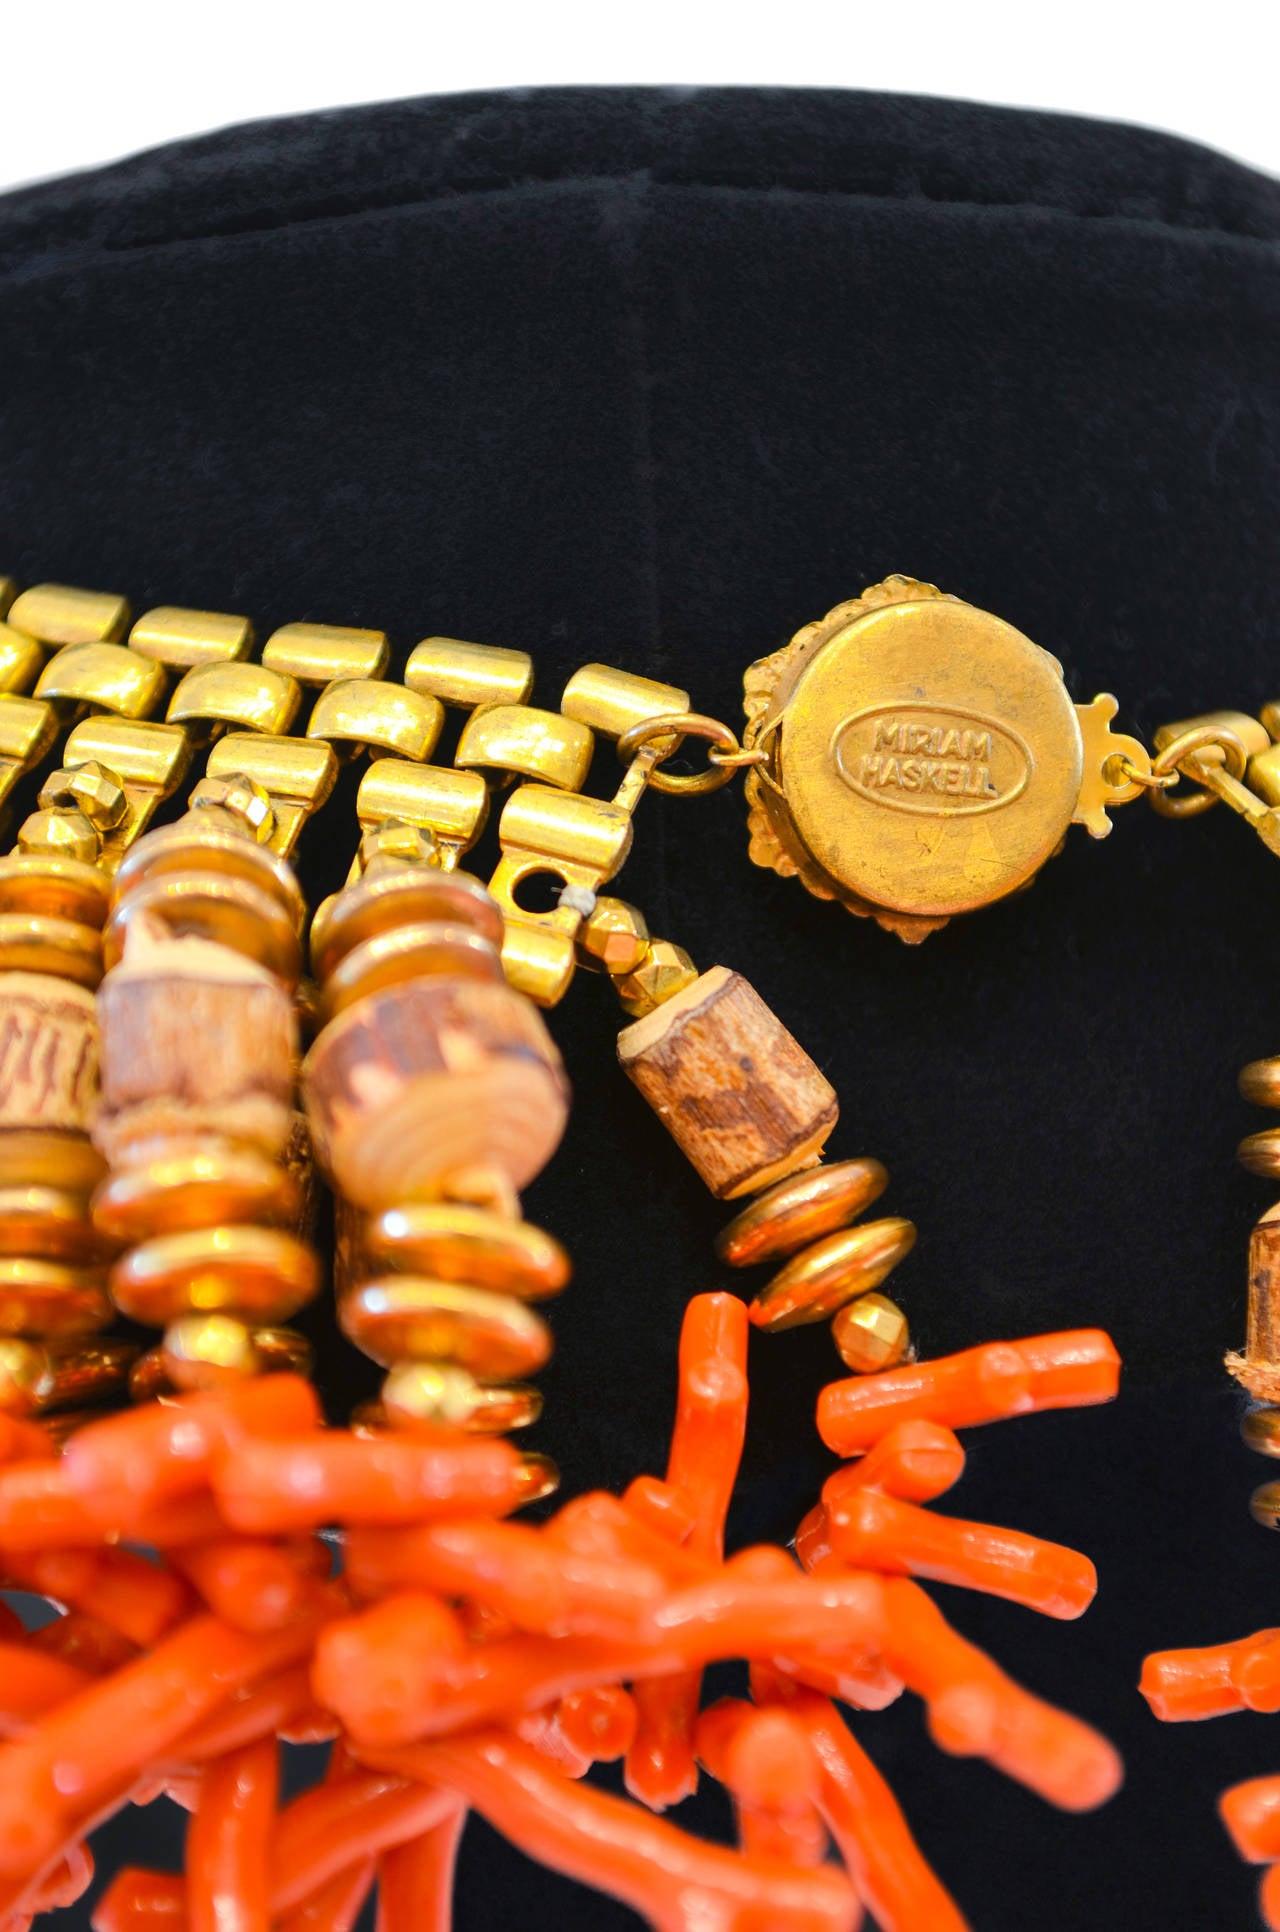 Women's Miriam Haskell Fringe Bib Necklace For Sale